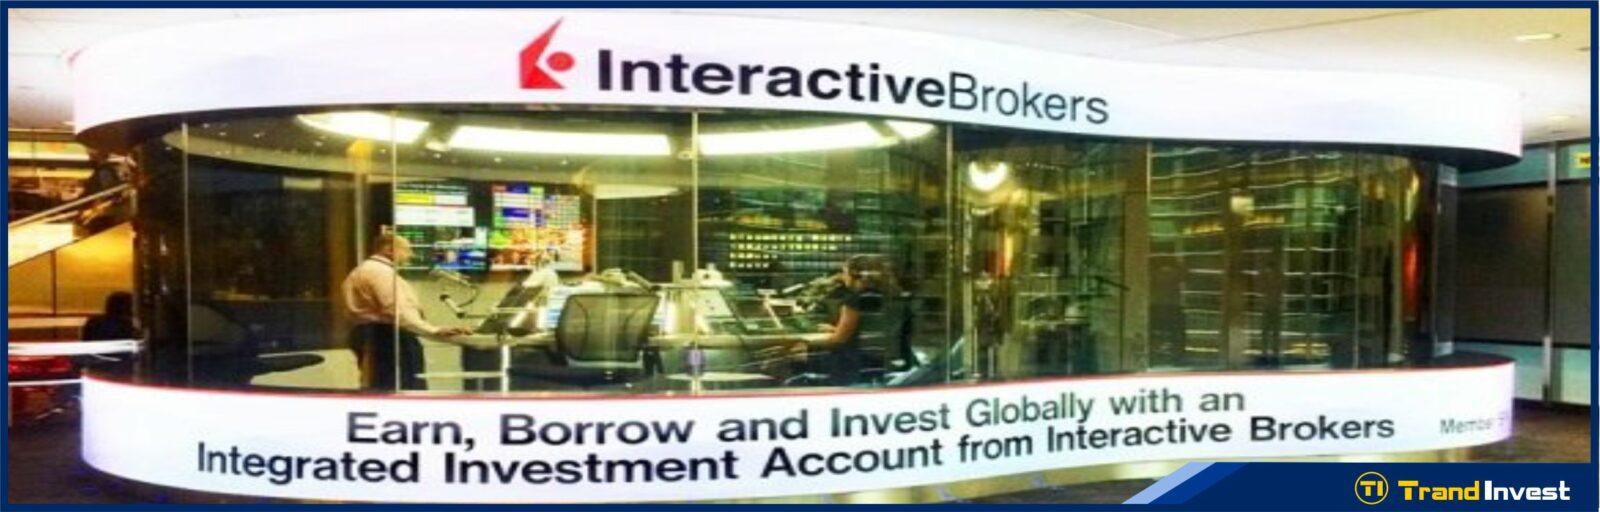 Interactive brokers инвестиции